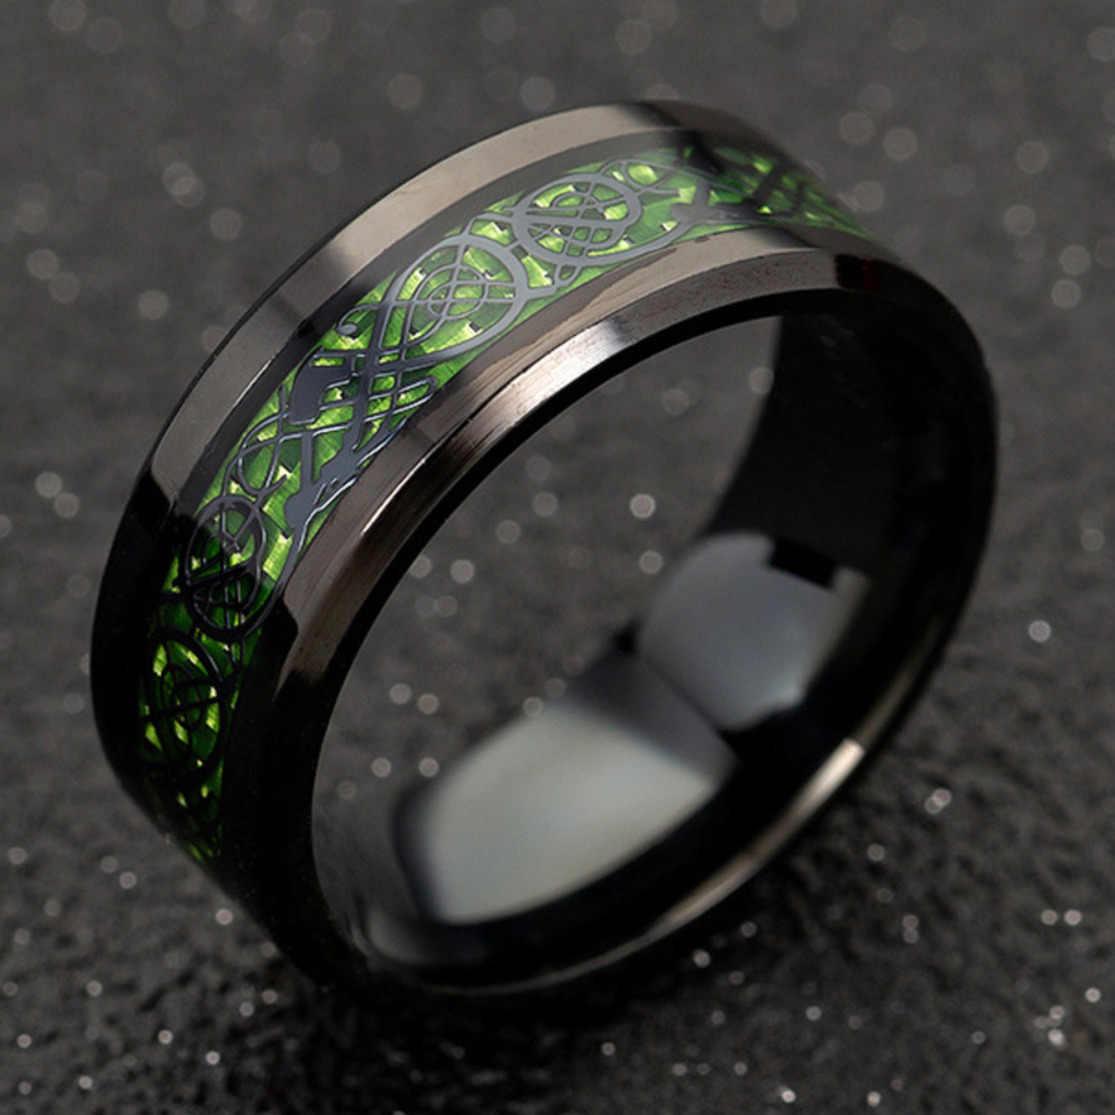 8mm הדרקון גברים של שחור אדום ופחמן סיבי נירוסטה ירוק מסיבת טבעת לנוחות Fit חתונה טבעות להקת גברים אביזרים